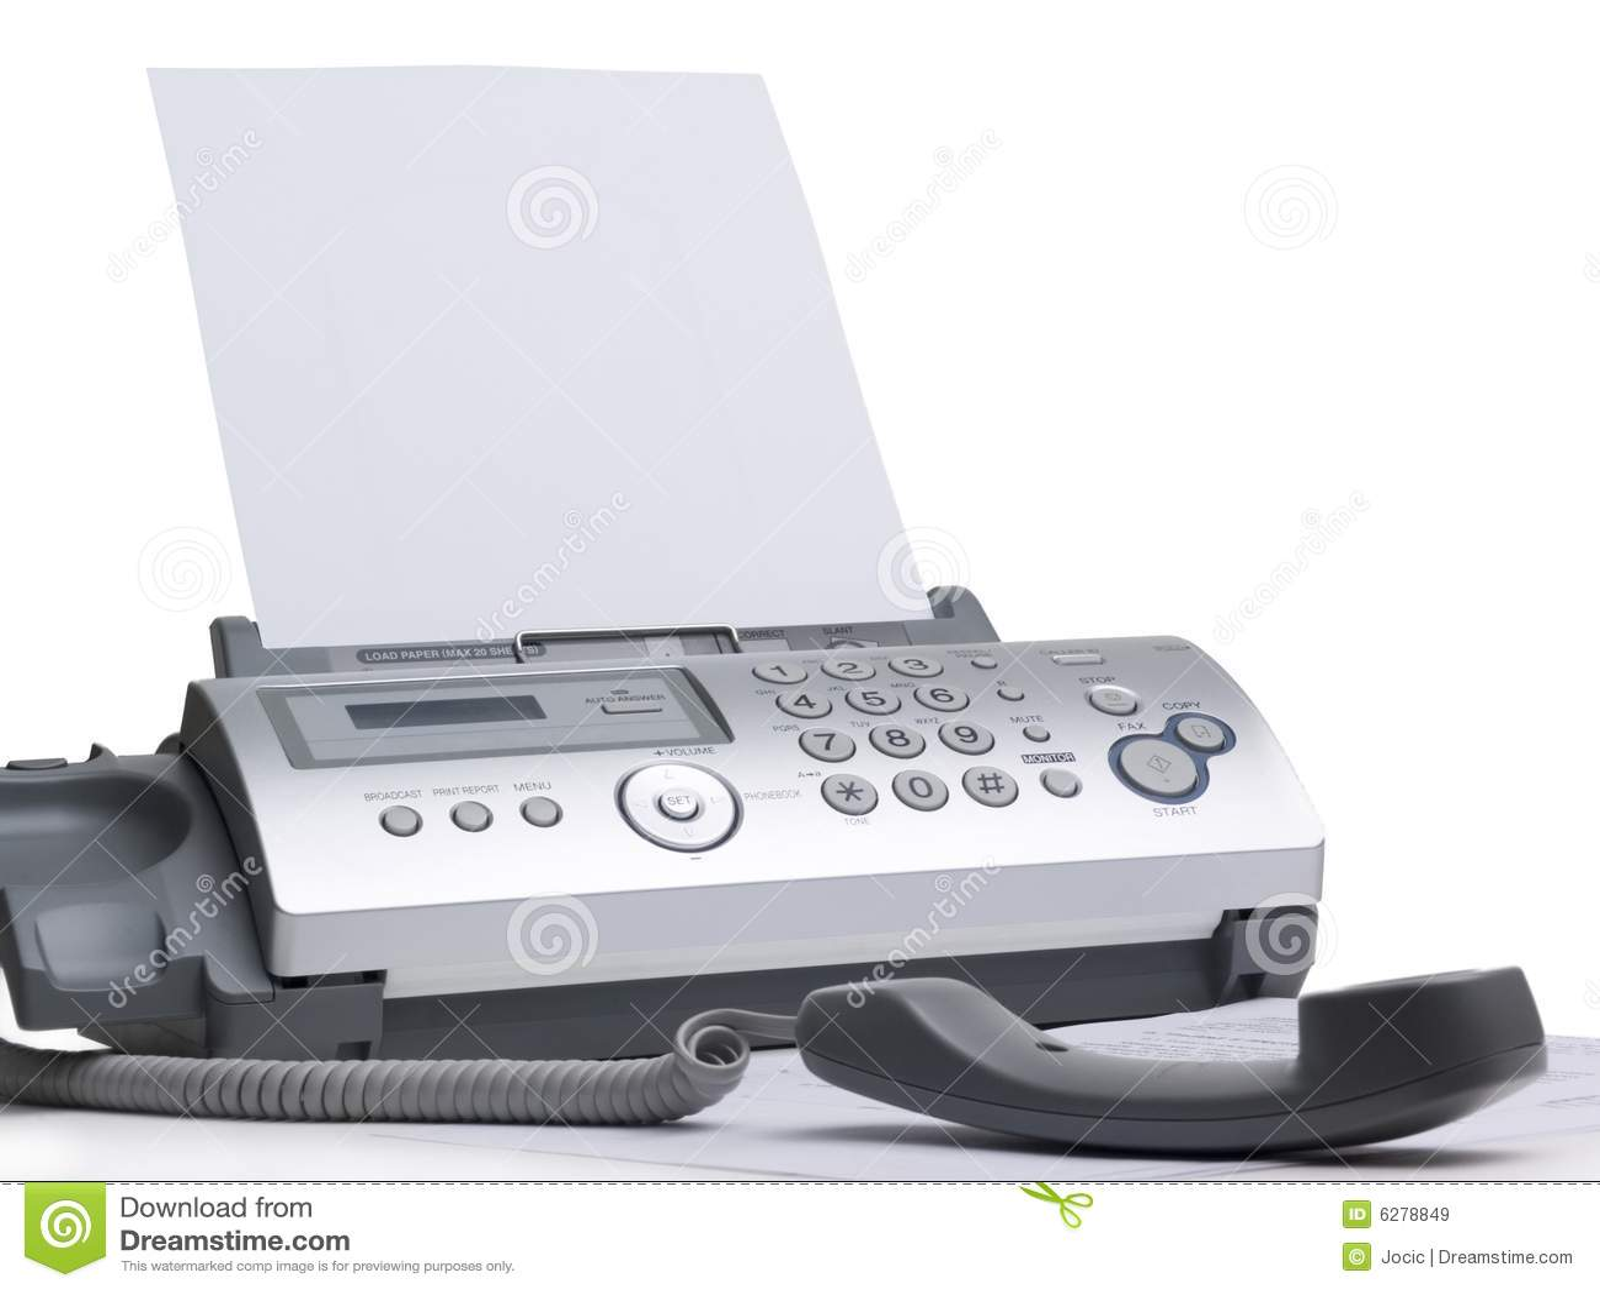 fax free: